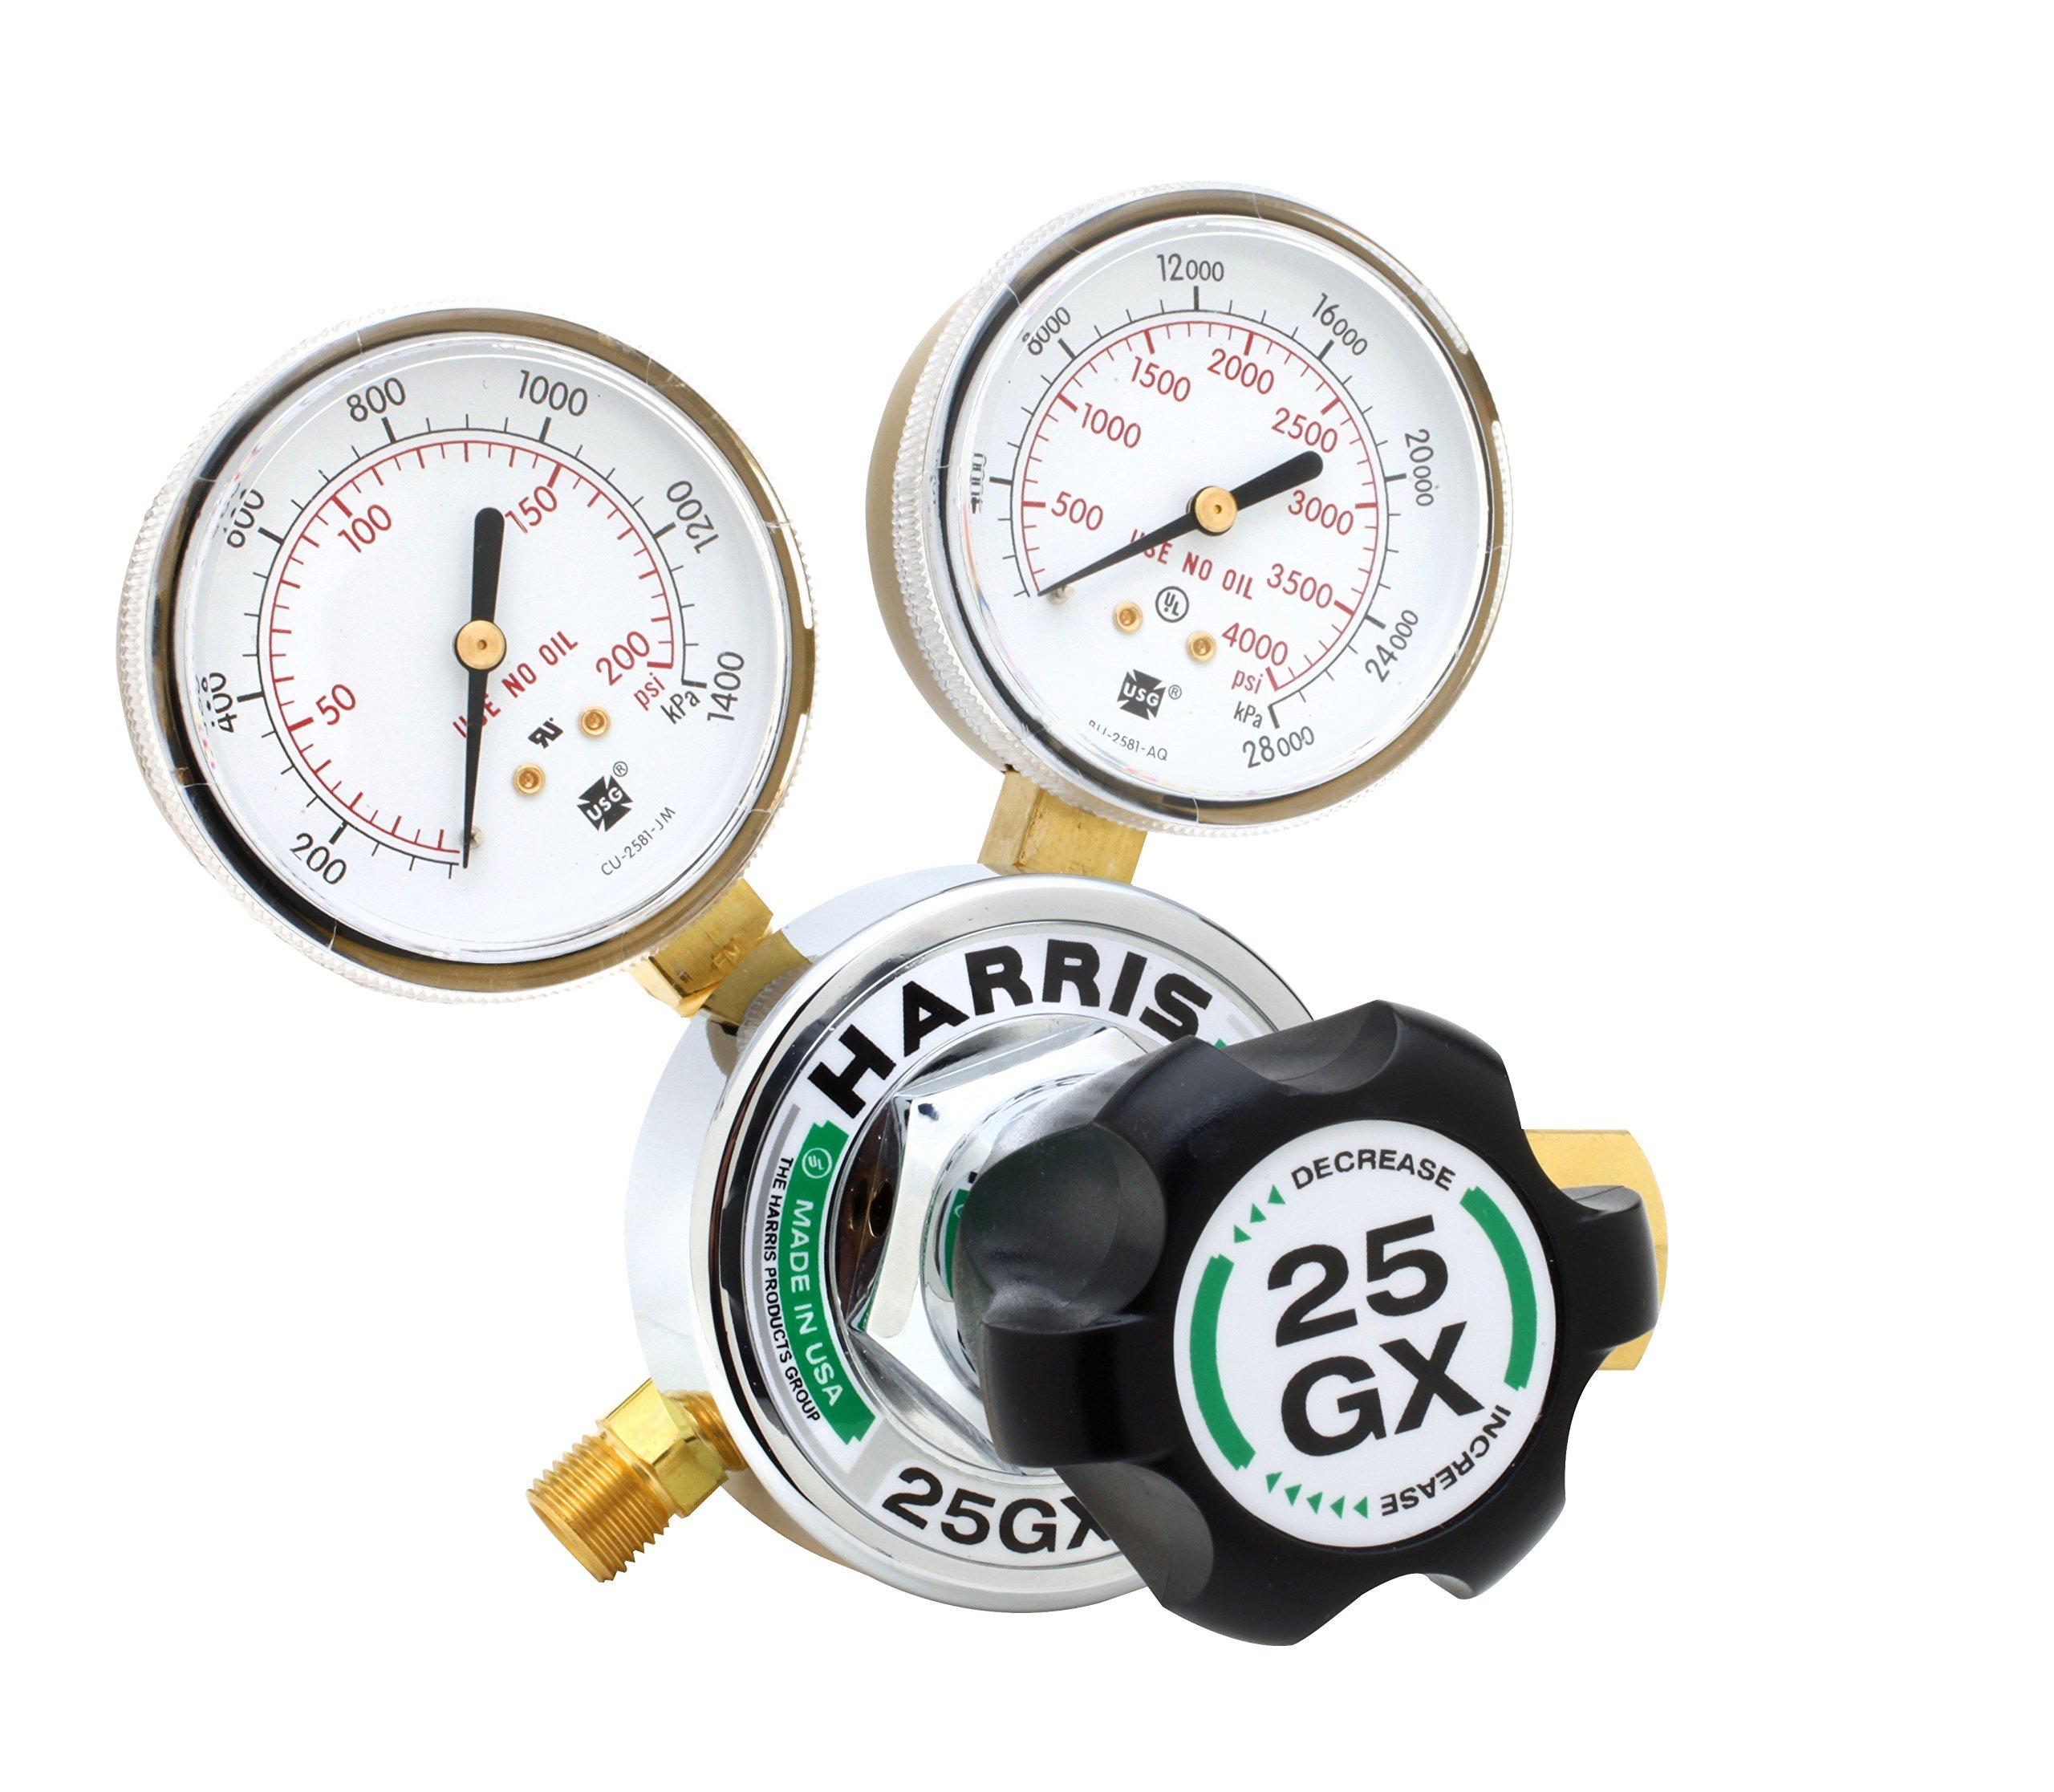 Harris 3000510 25GX Regulator, 145-540 by Harris